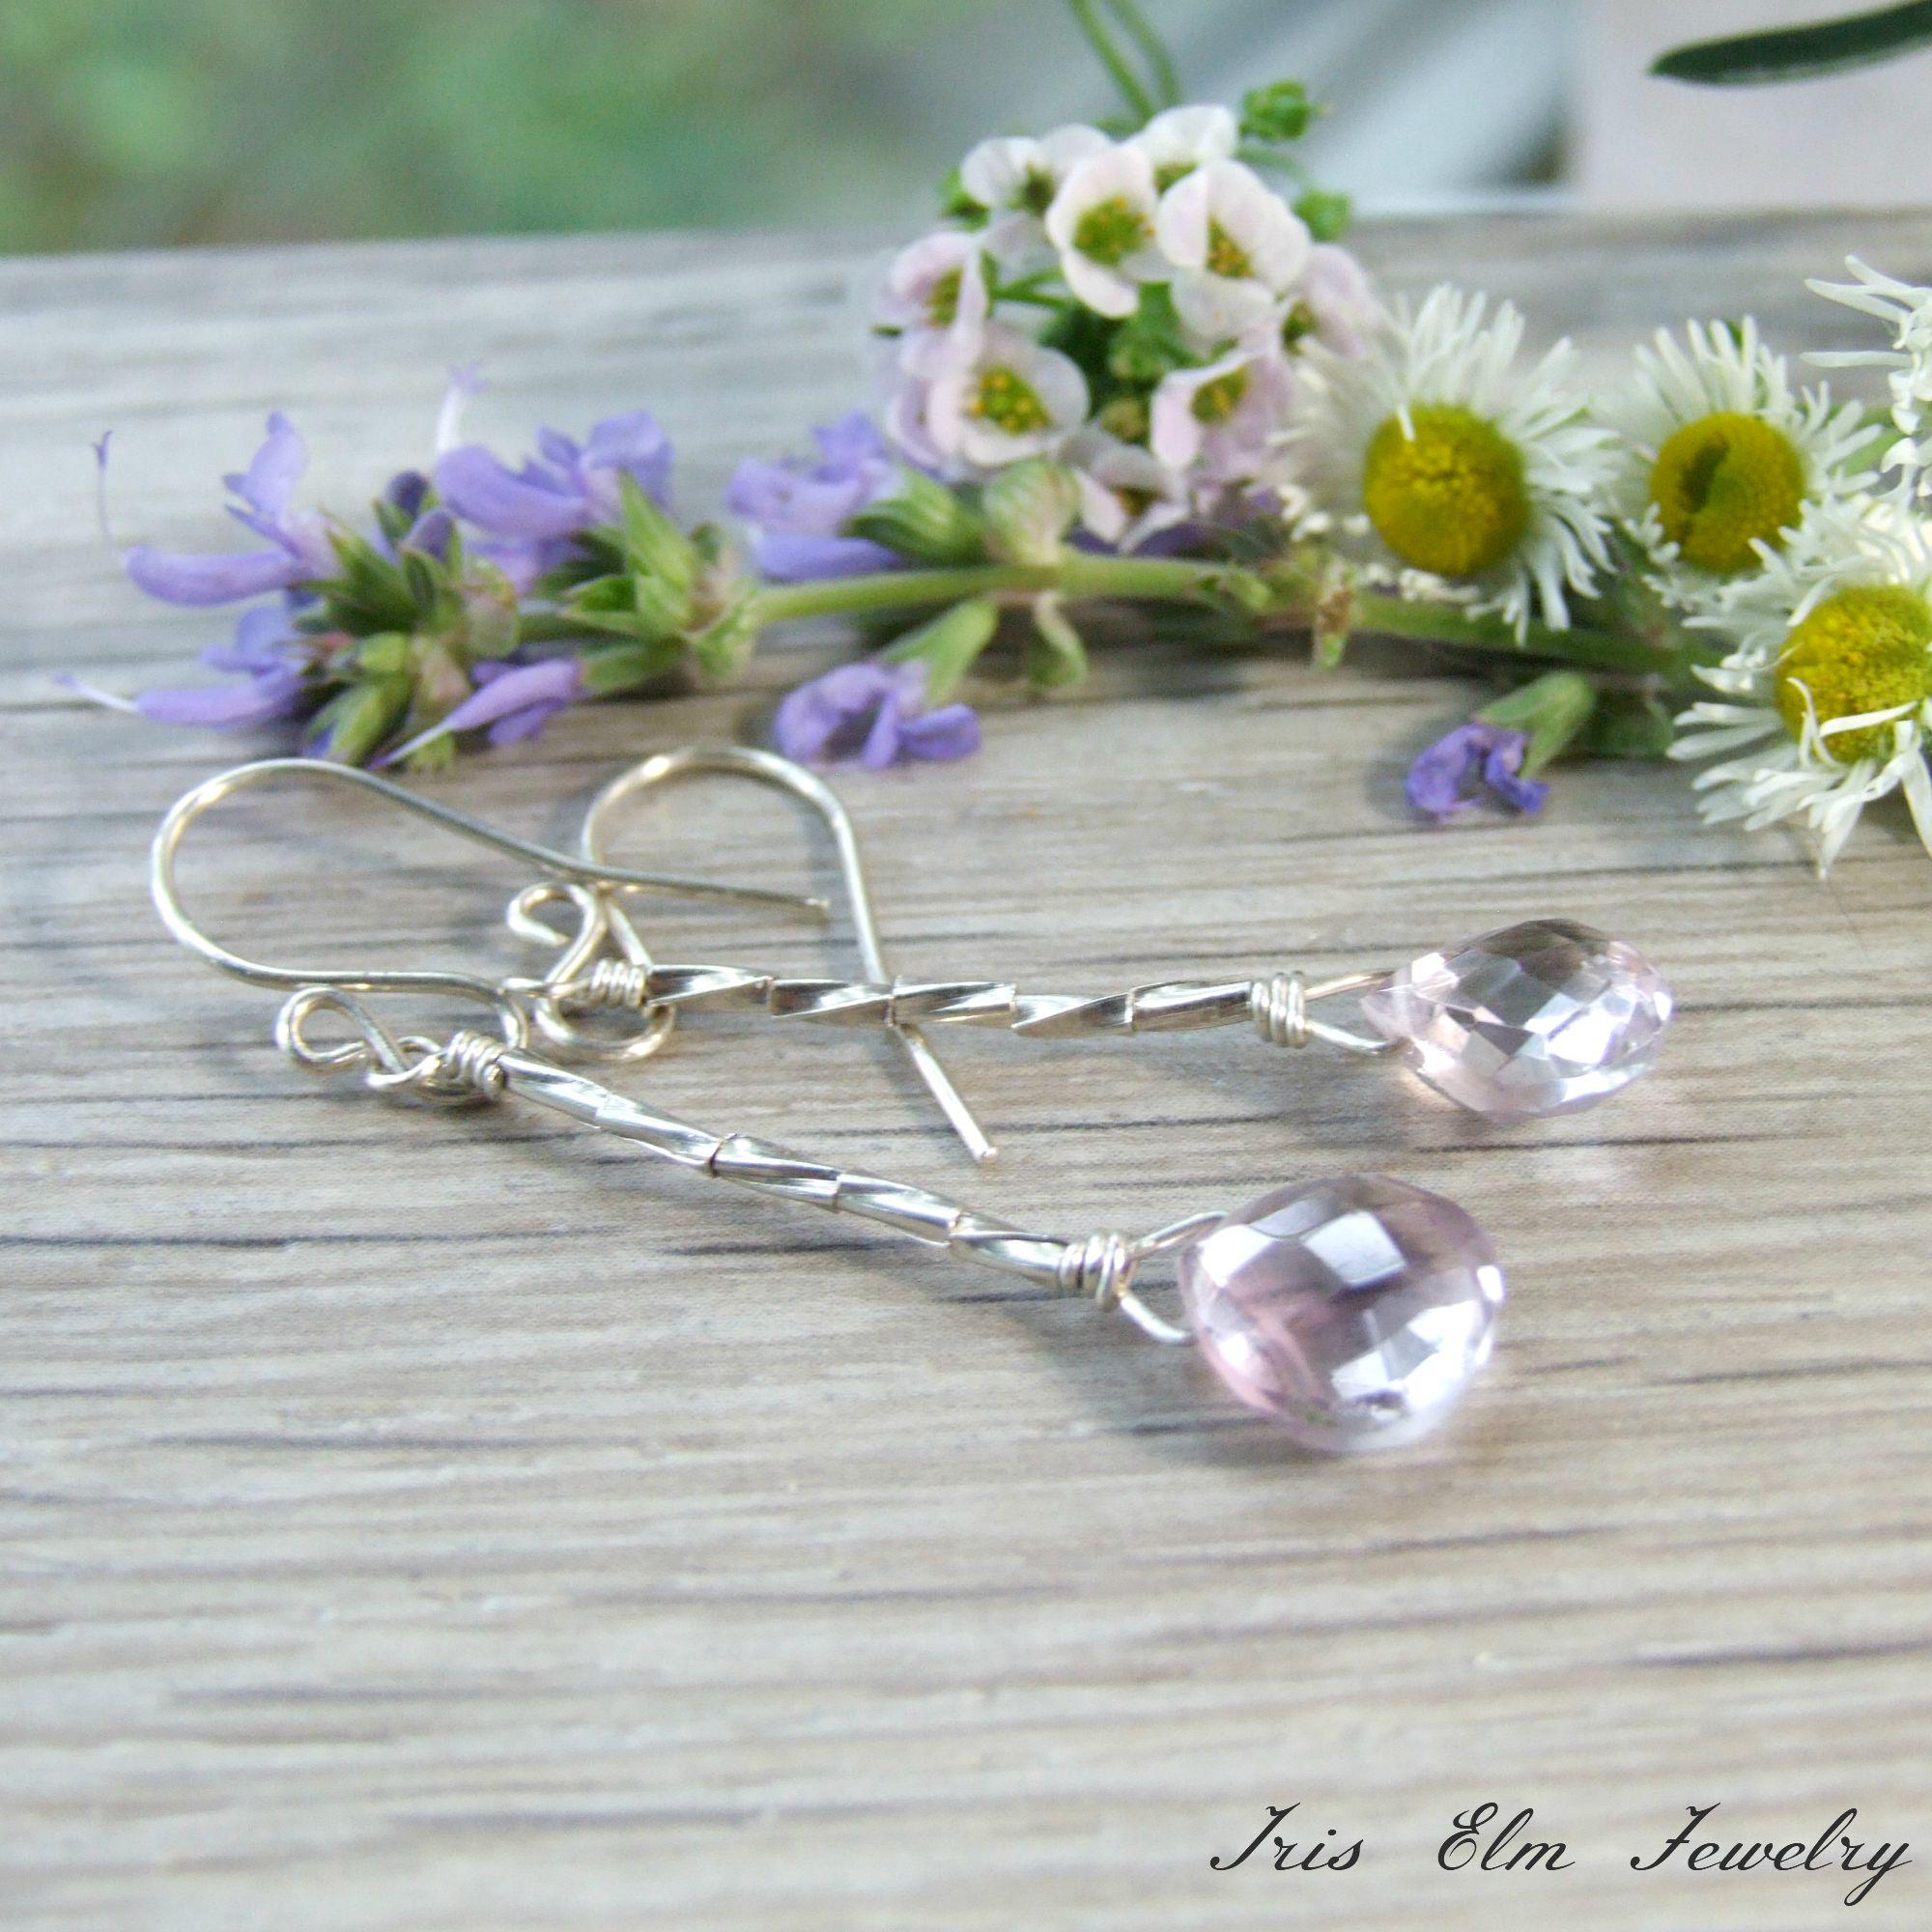 1ecf99eeb2d33 Pink Amethyst Sterling Earrings - Iris Elm Jewelry | Unique Artisan  Handmade Bohemian and Vintage Style Earrings, Bracelets, and Necklaces